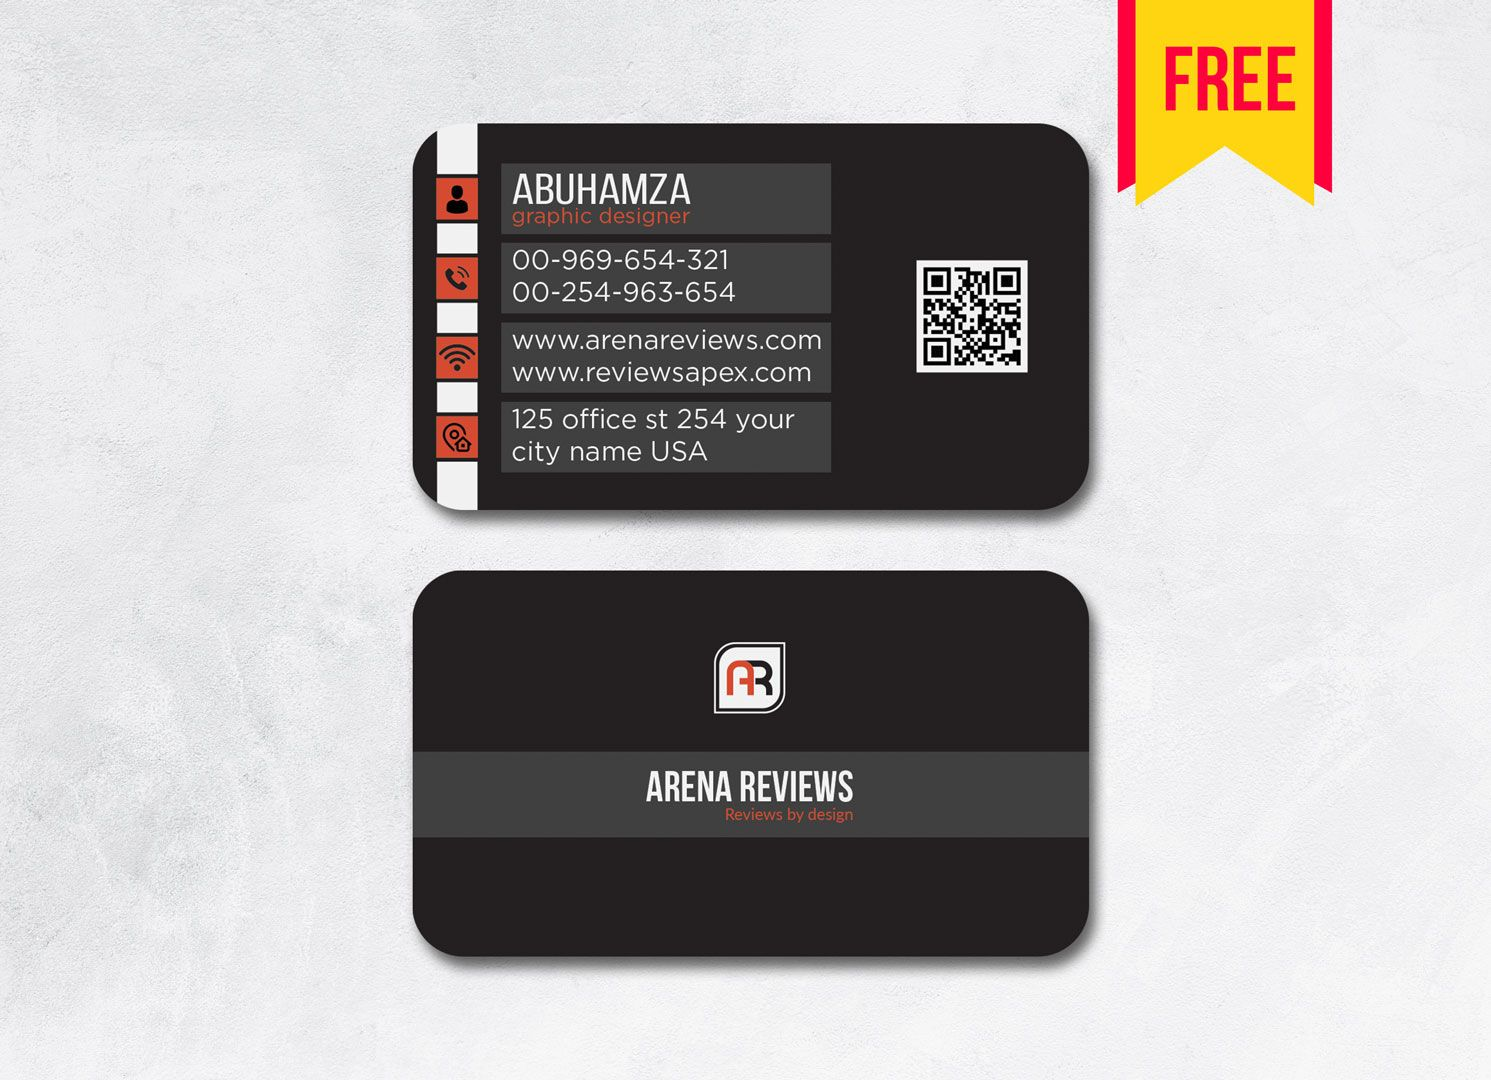 Dark Business Card Template Psd File Free Download Intended For Templat In 2020 Business Card Template Photoshop Visiting Card Templates Free Business Card Templates